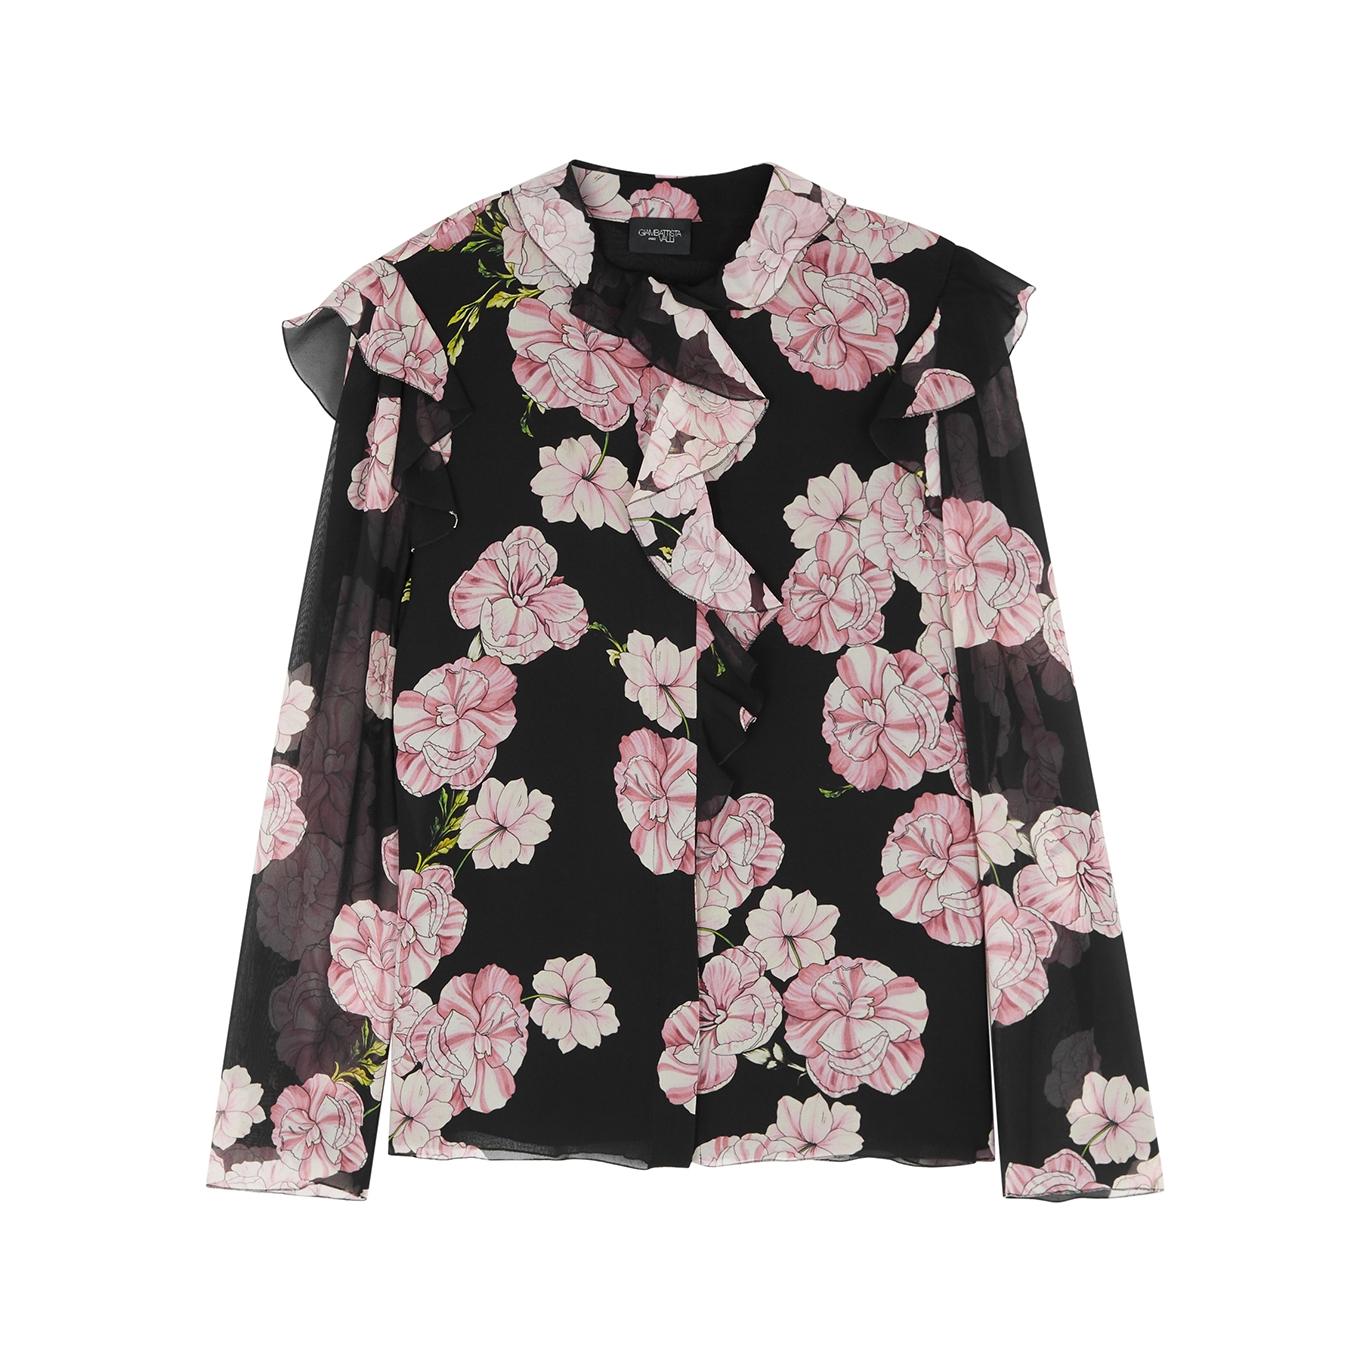 e81b7c001bc11 Giambattista Valli Floral-print silk blouse - Harvey Nichols